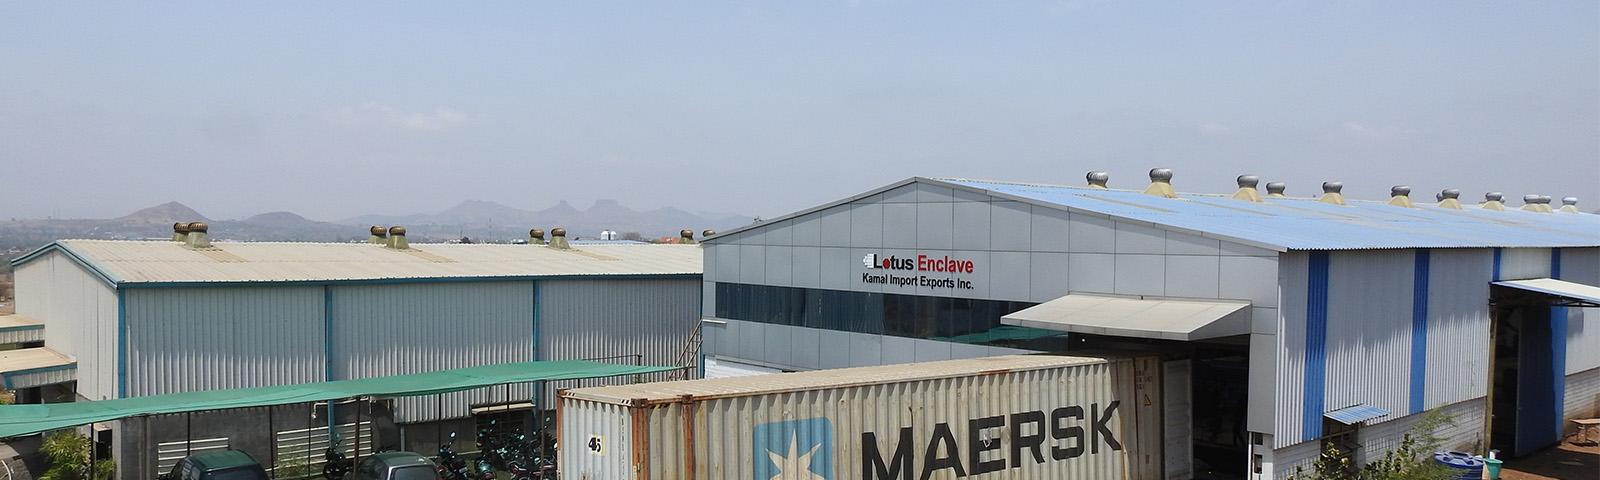 web 1 factory 1